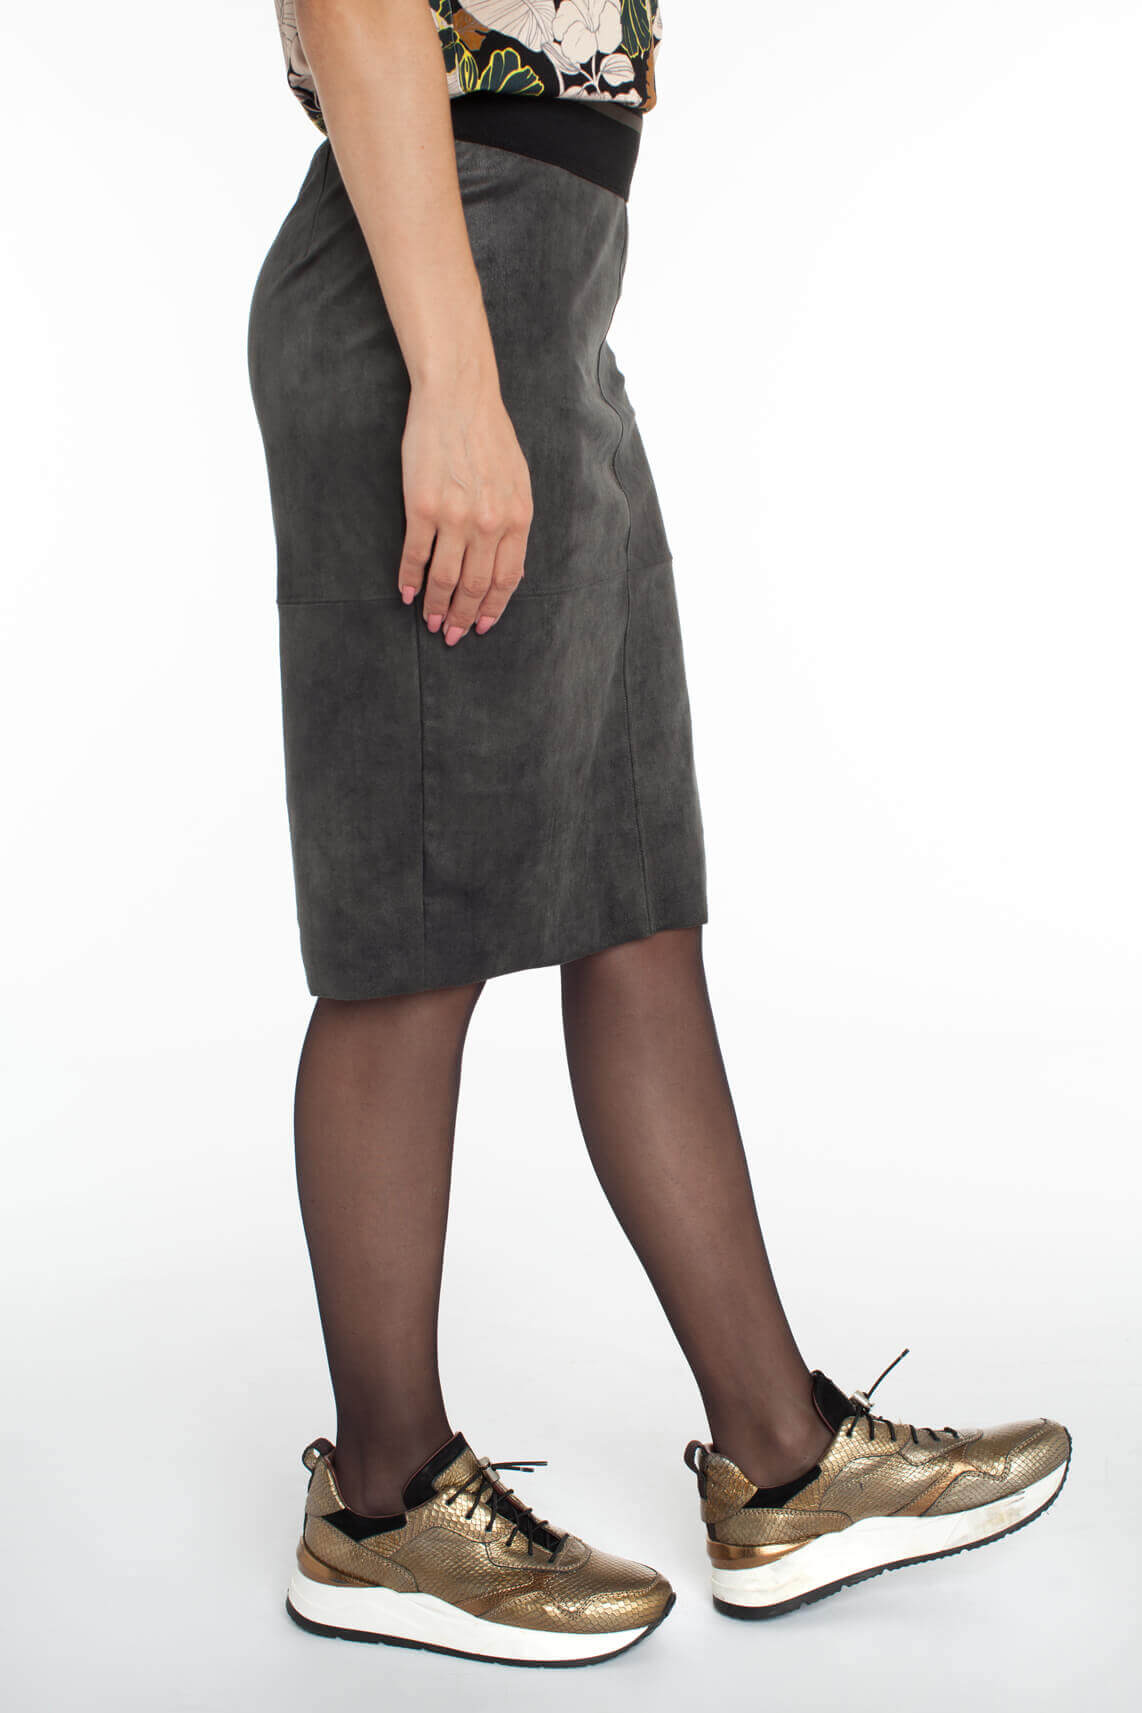 Anna Dames Fake leather rok groen